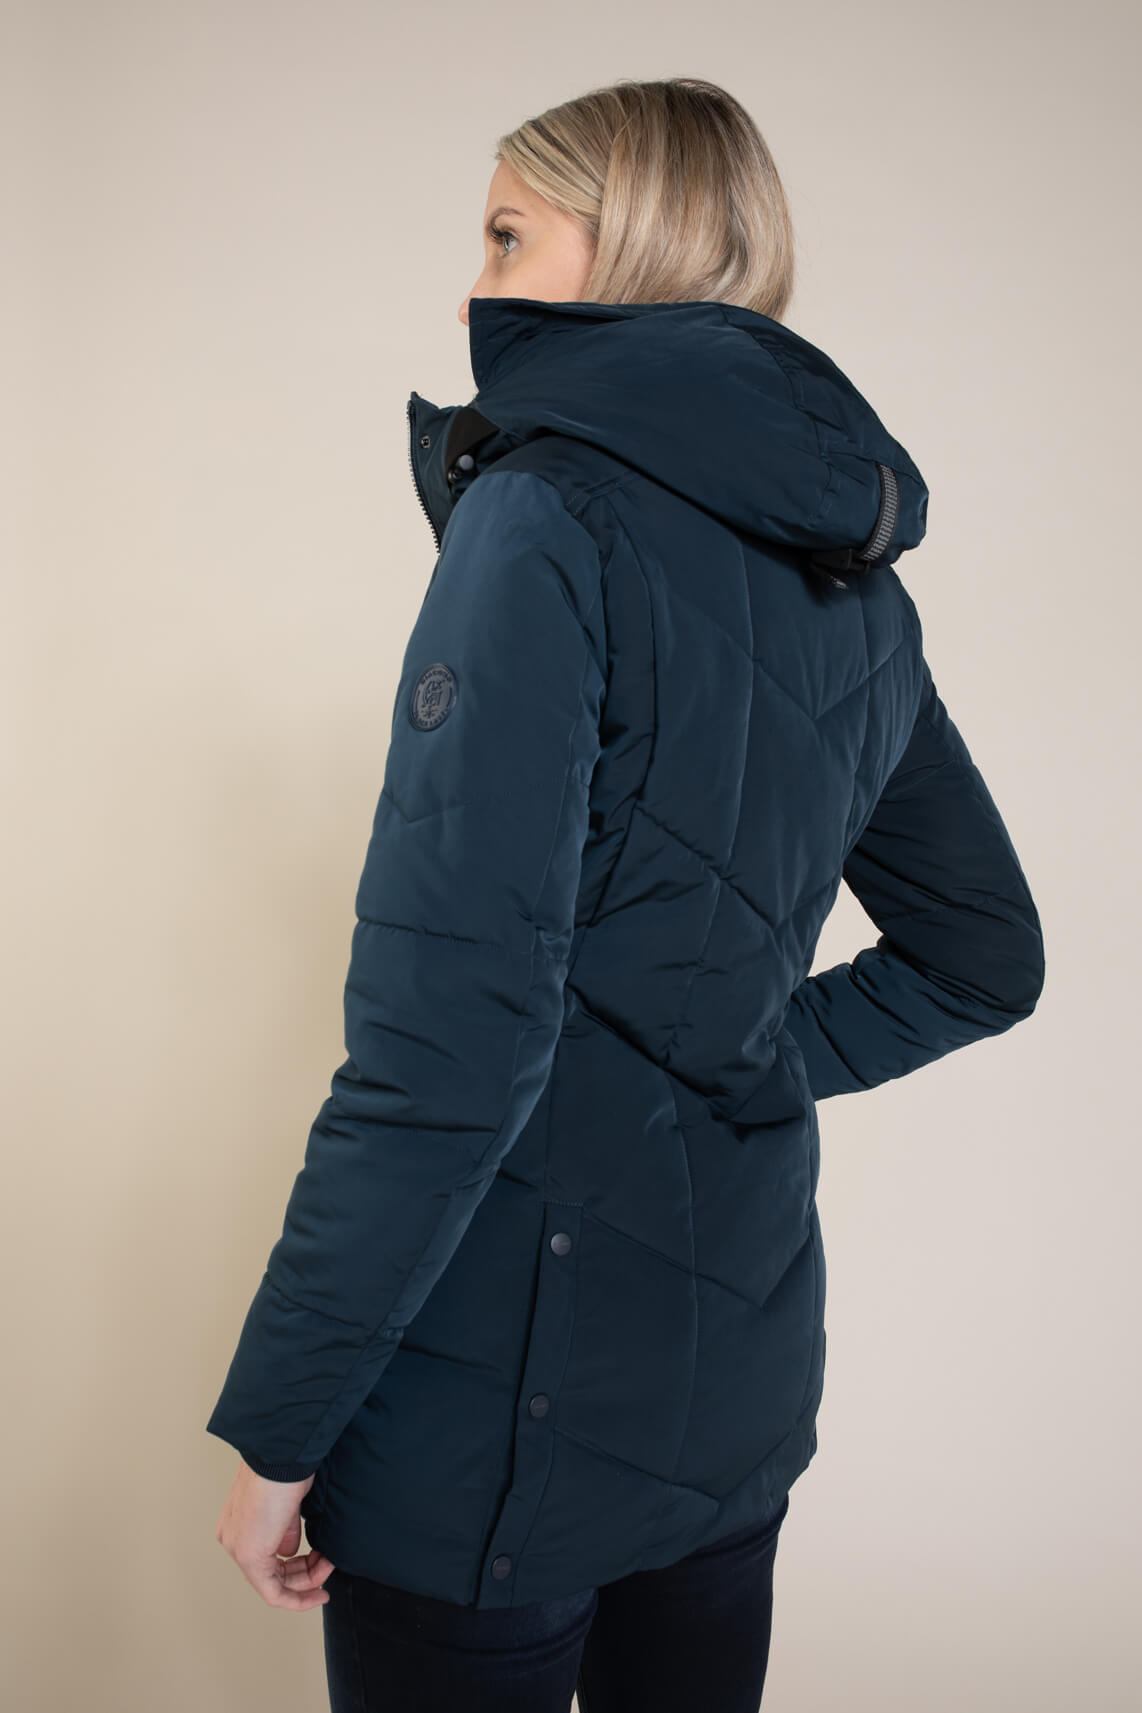 Giacomo Dames Coat met capuchon Blauw